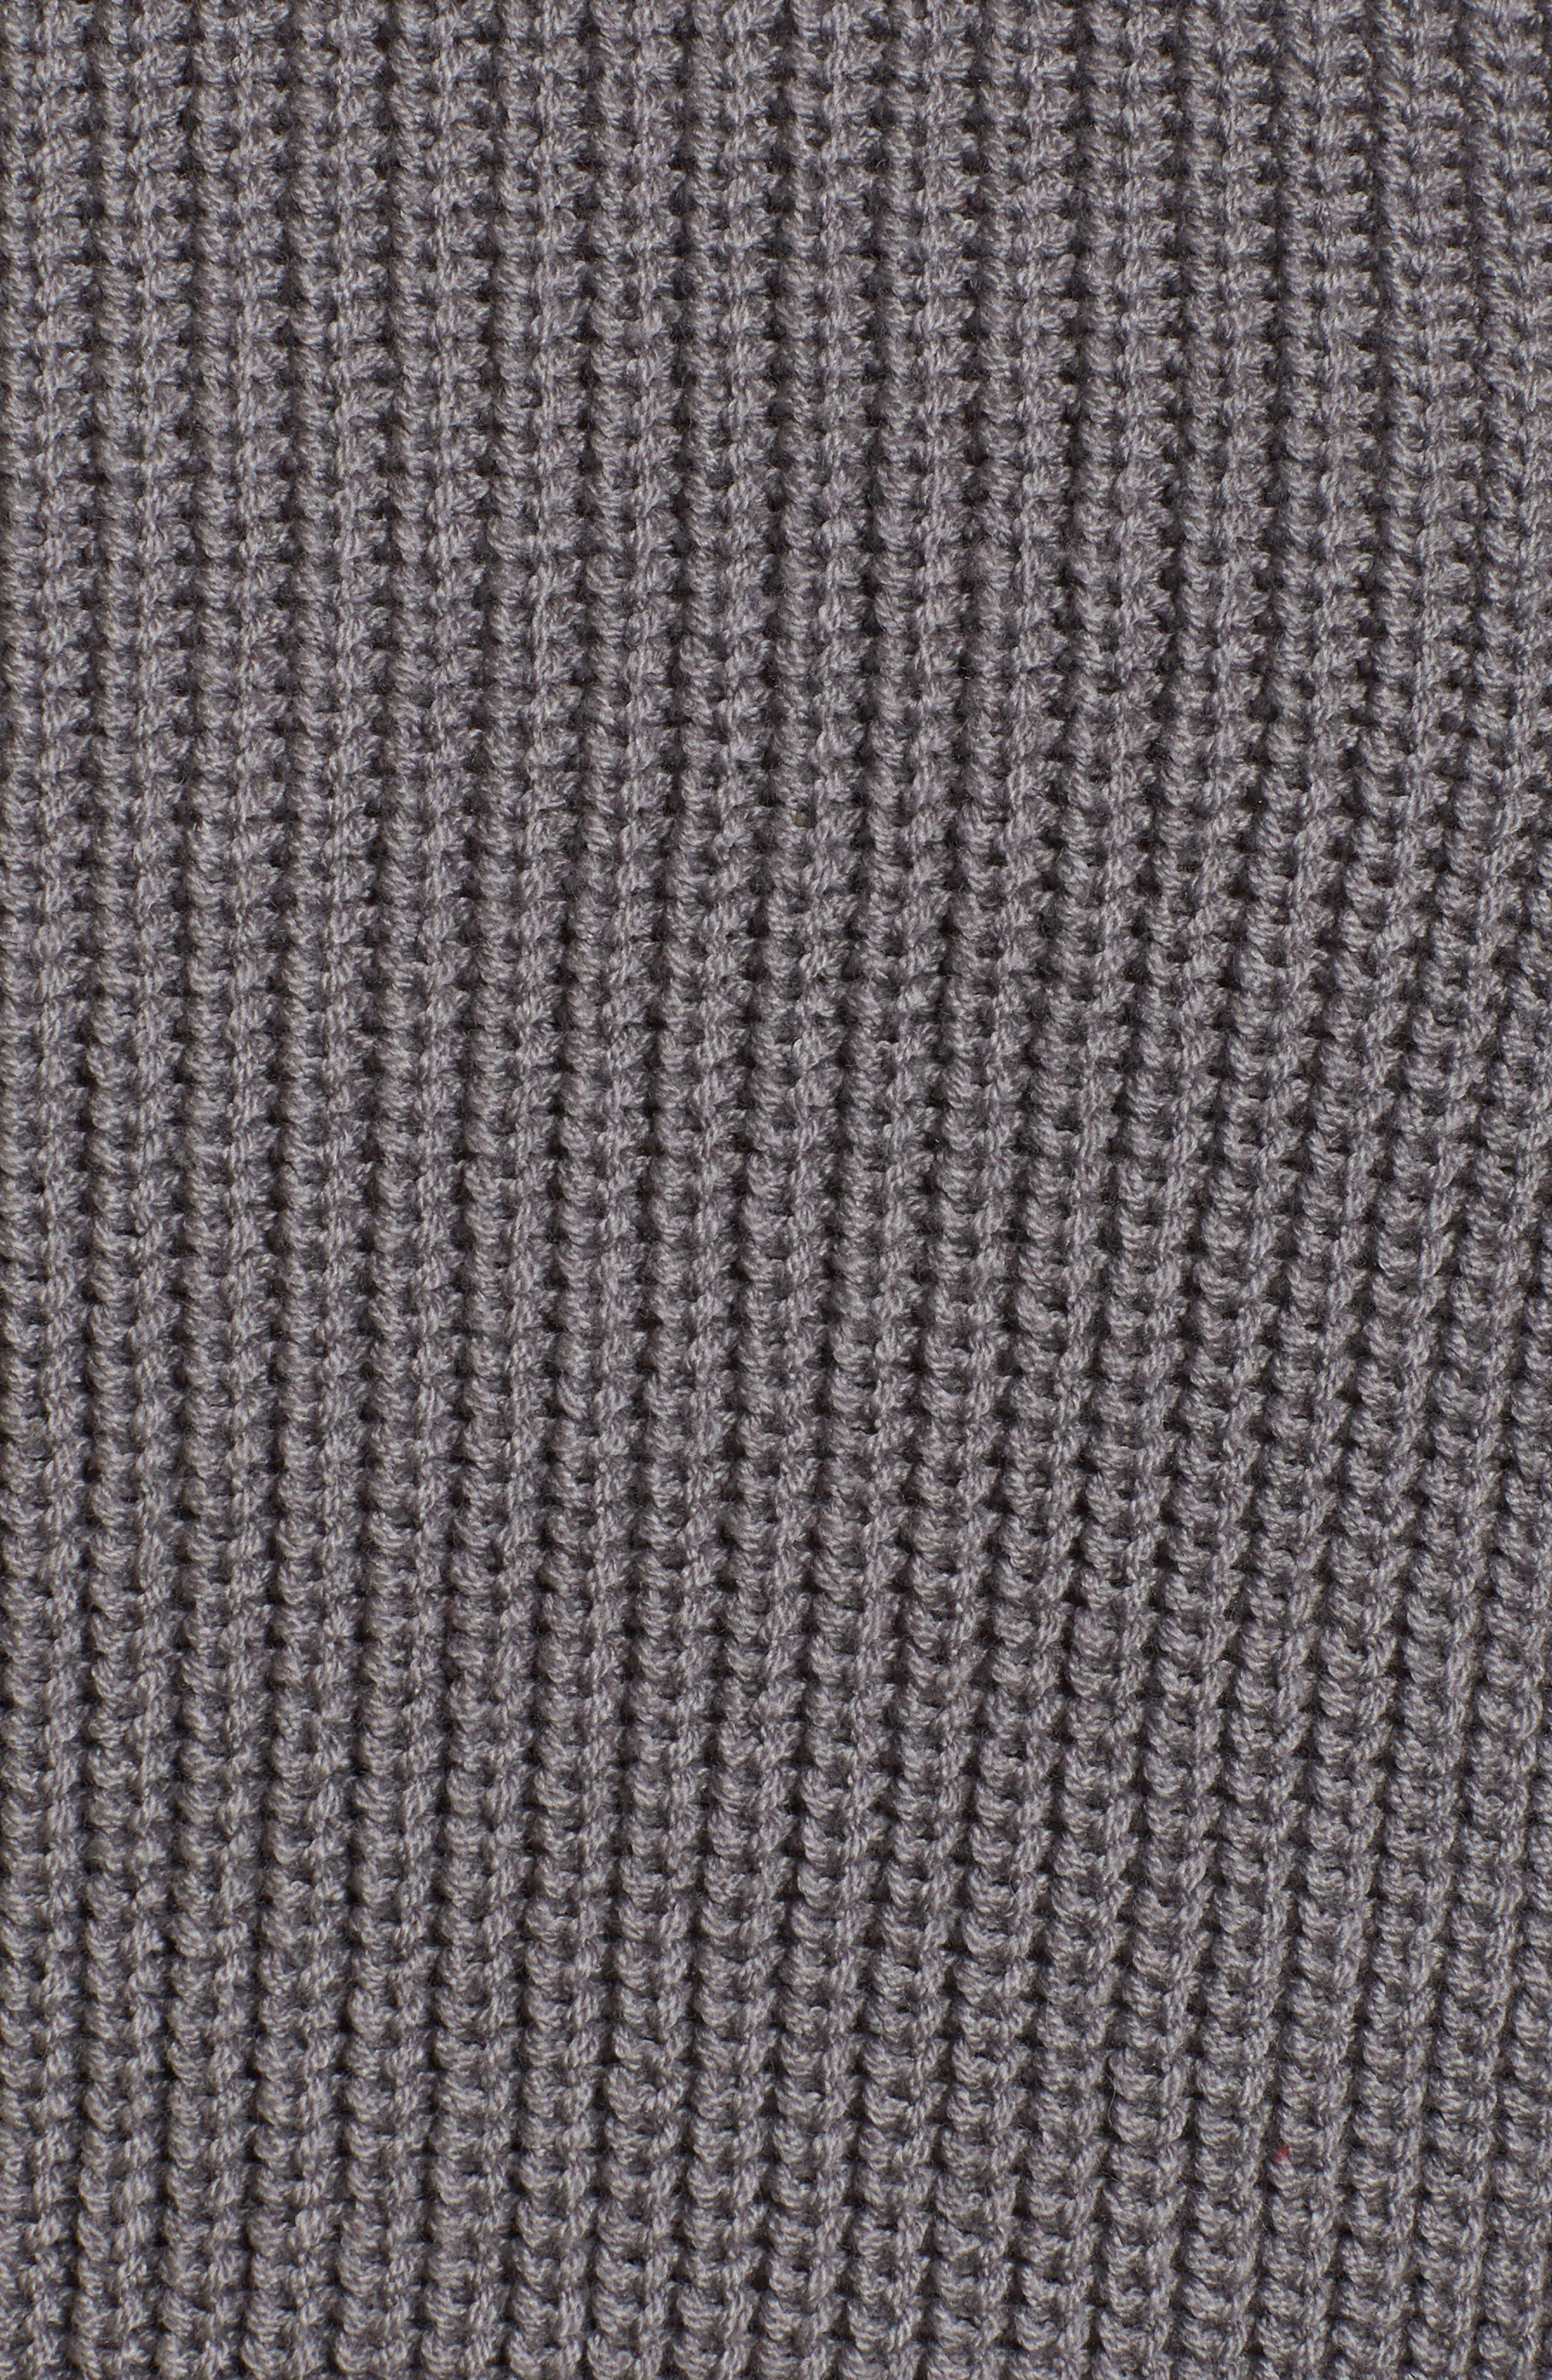 Puff Sleeve Turtleneck Sweater,                             Alternate thumbnail 5, color,                             030